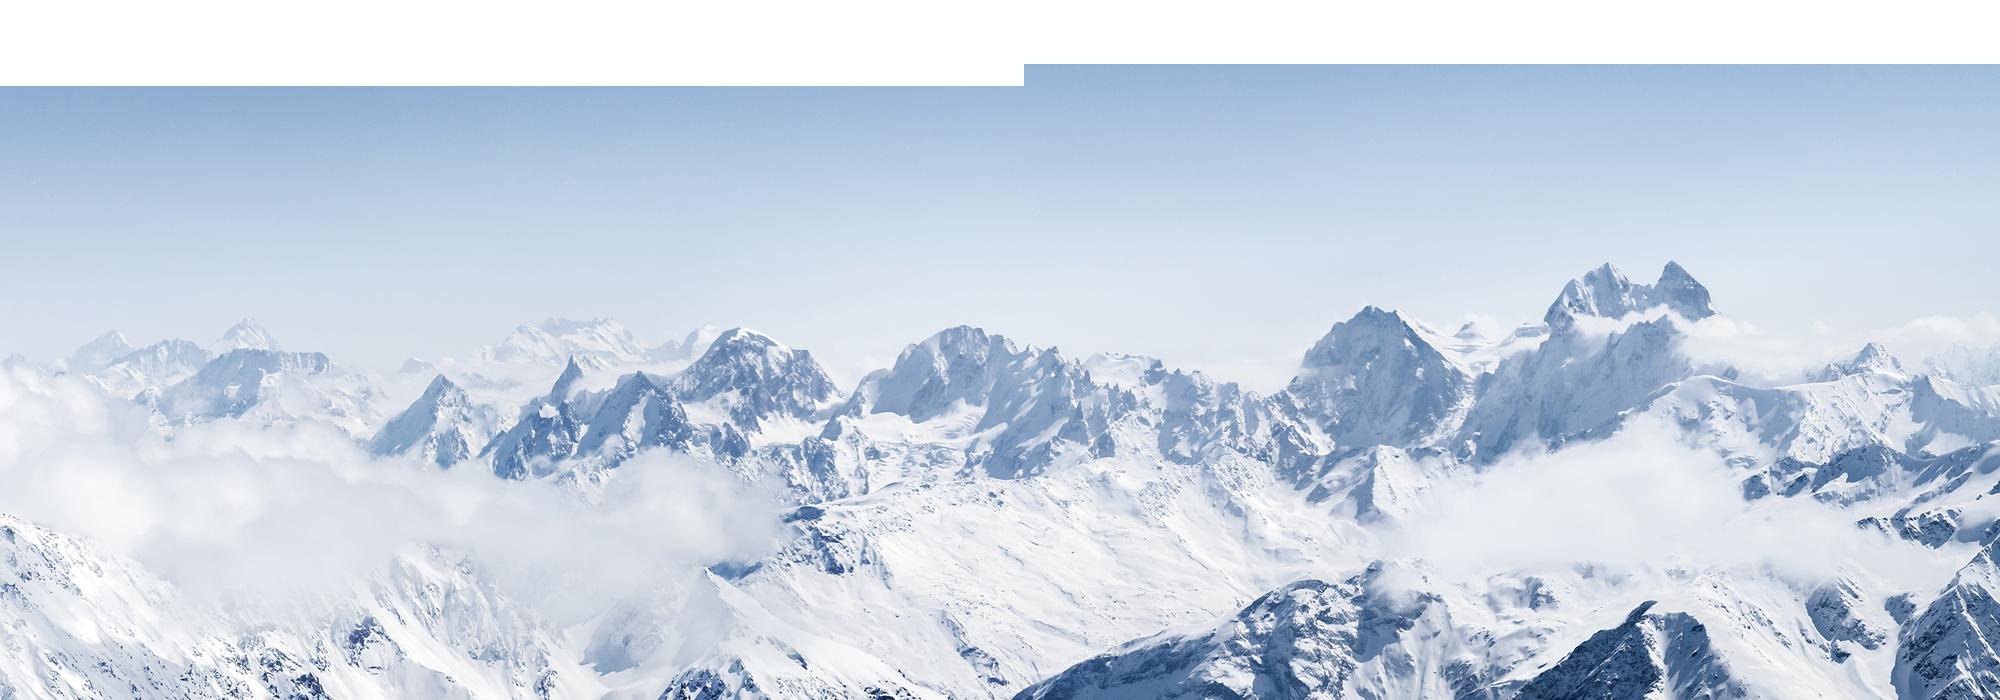 inchirieri ski Poiana Brasov